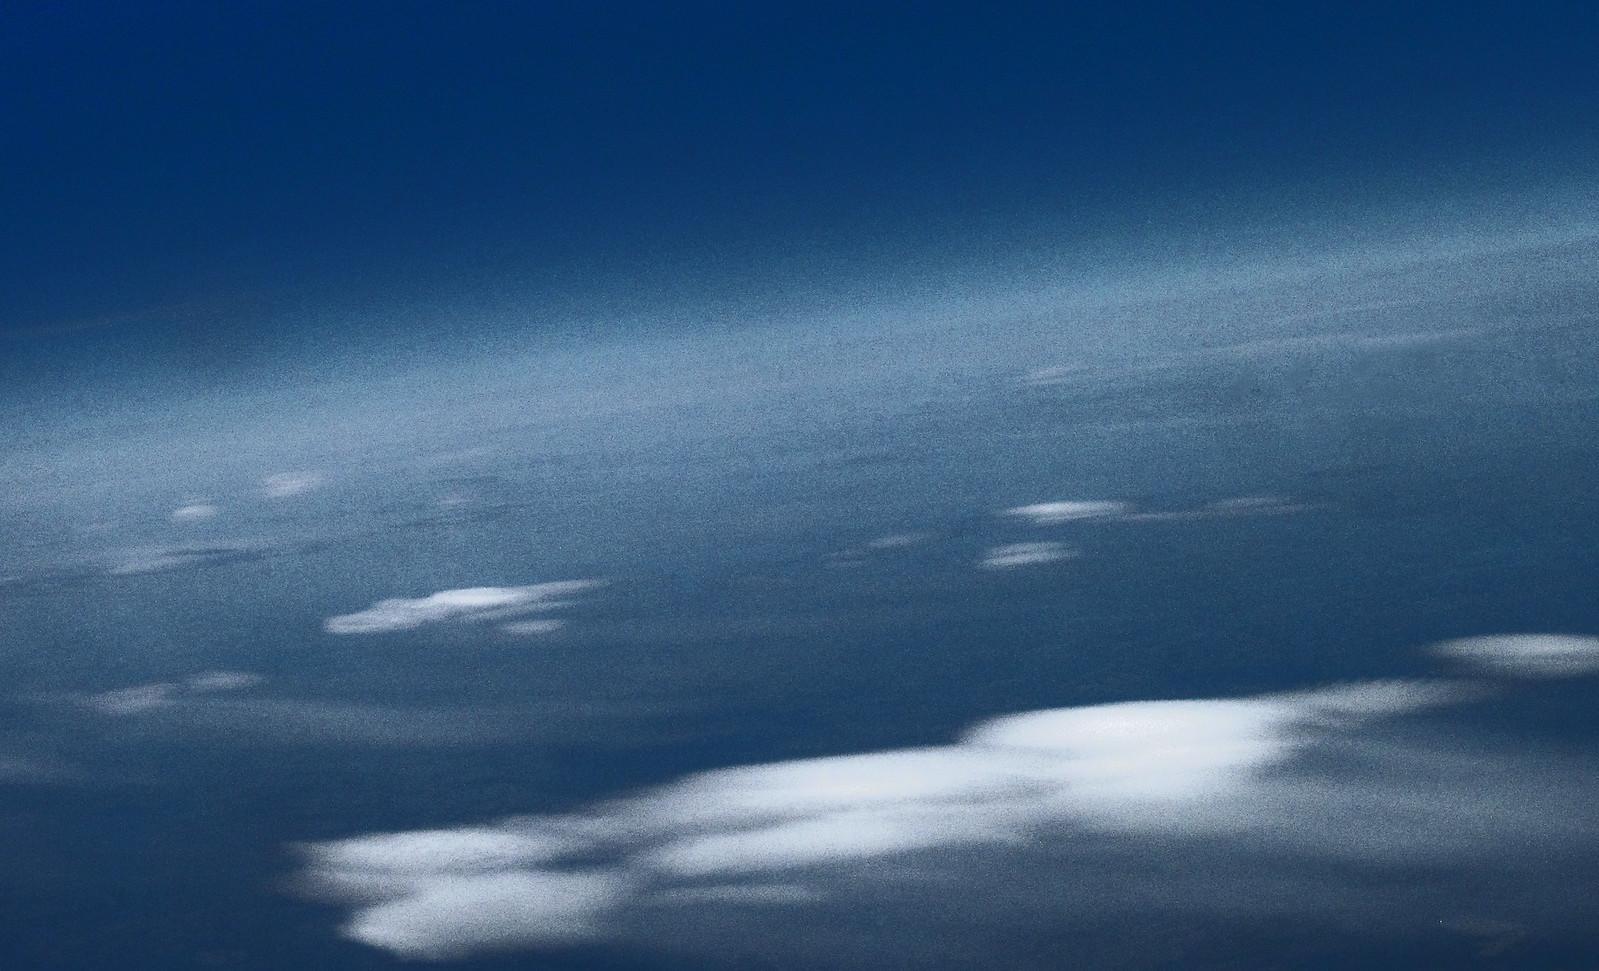 aérea cielo 01